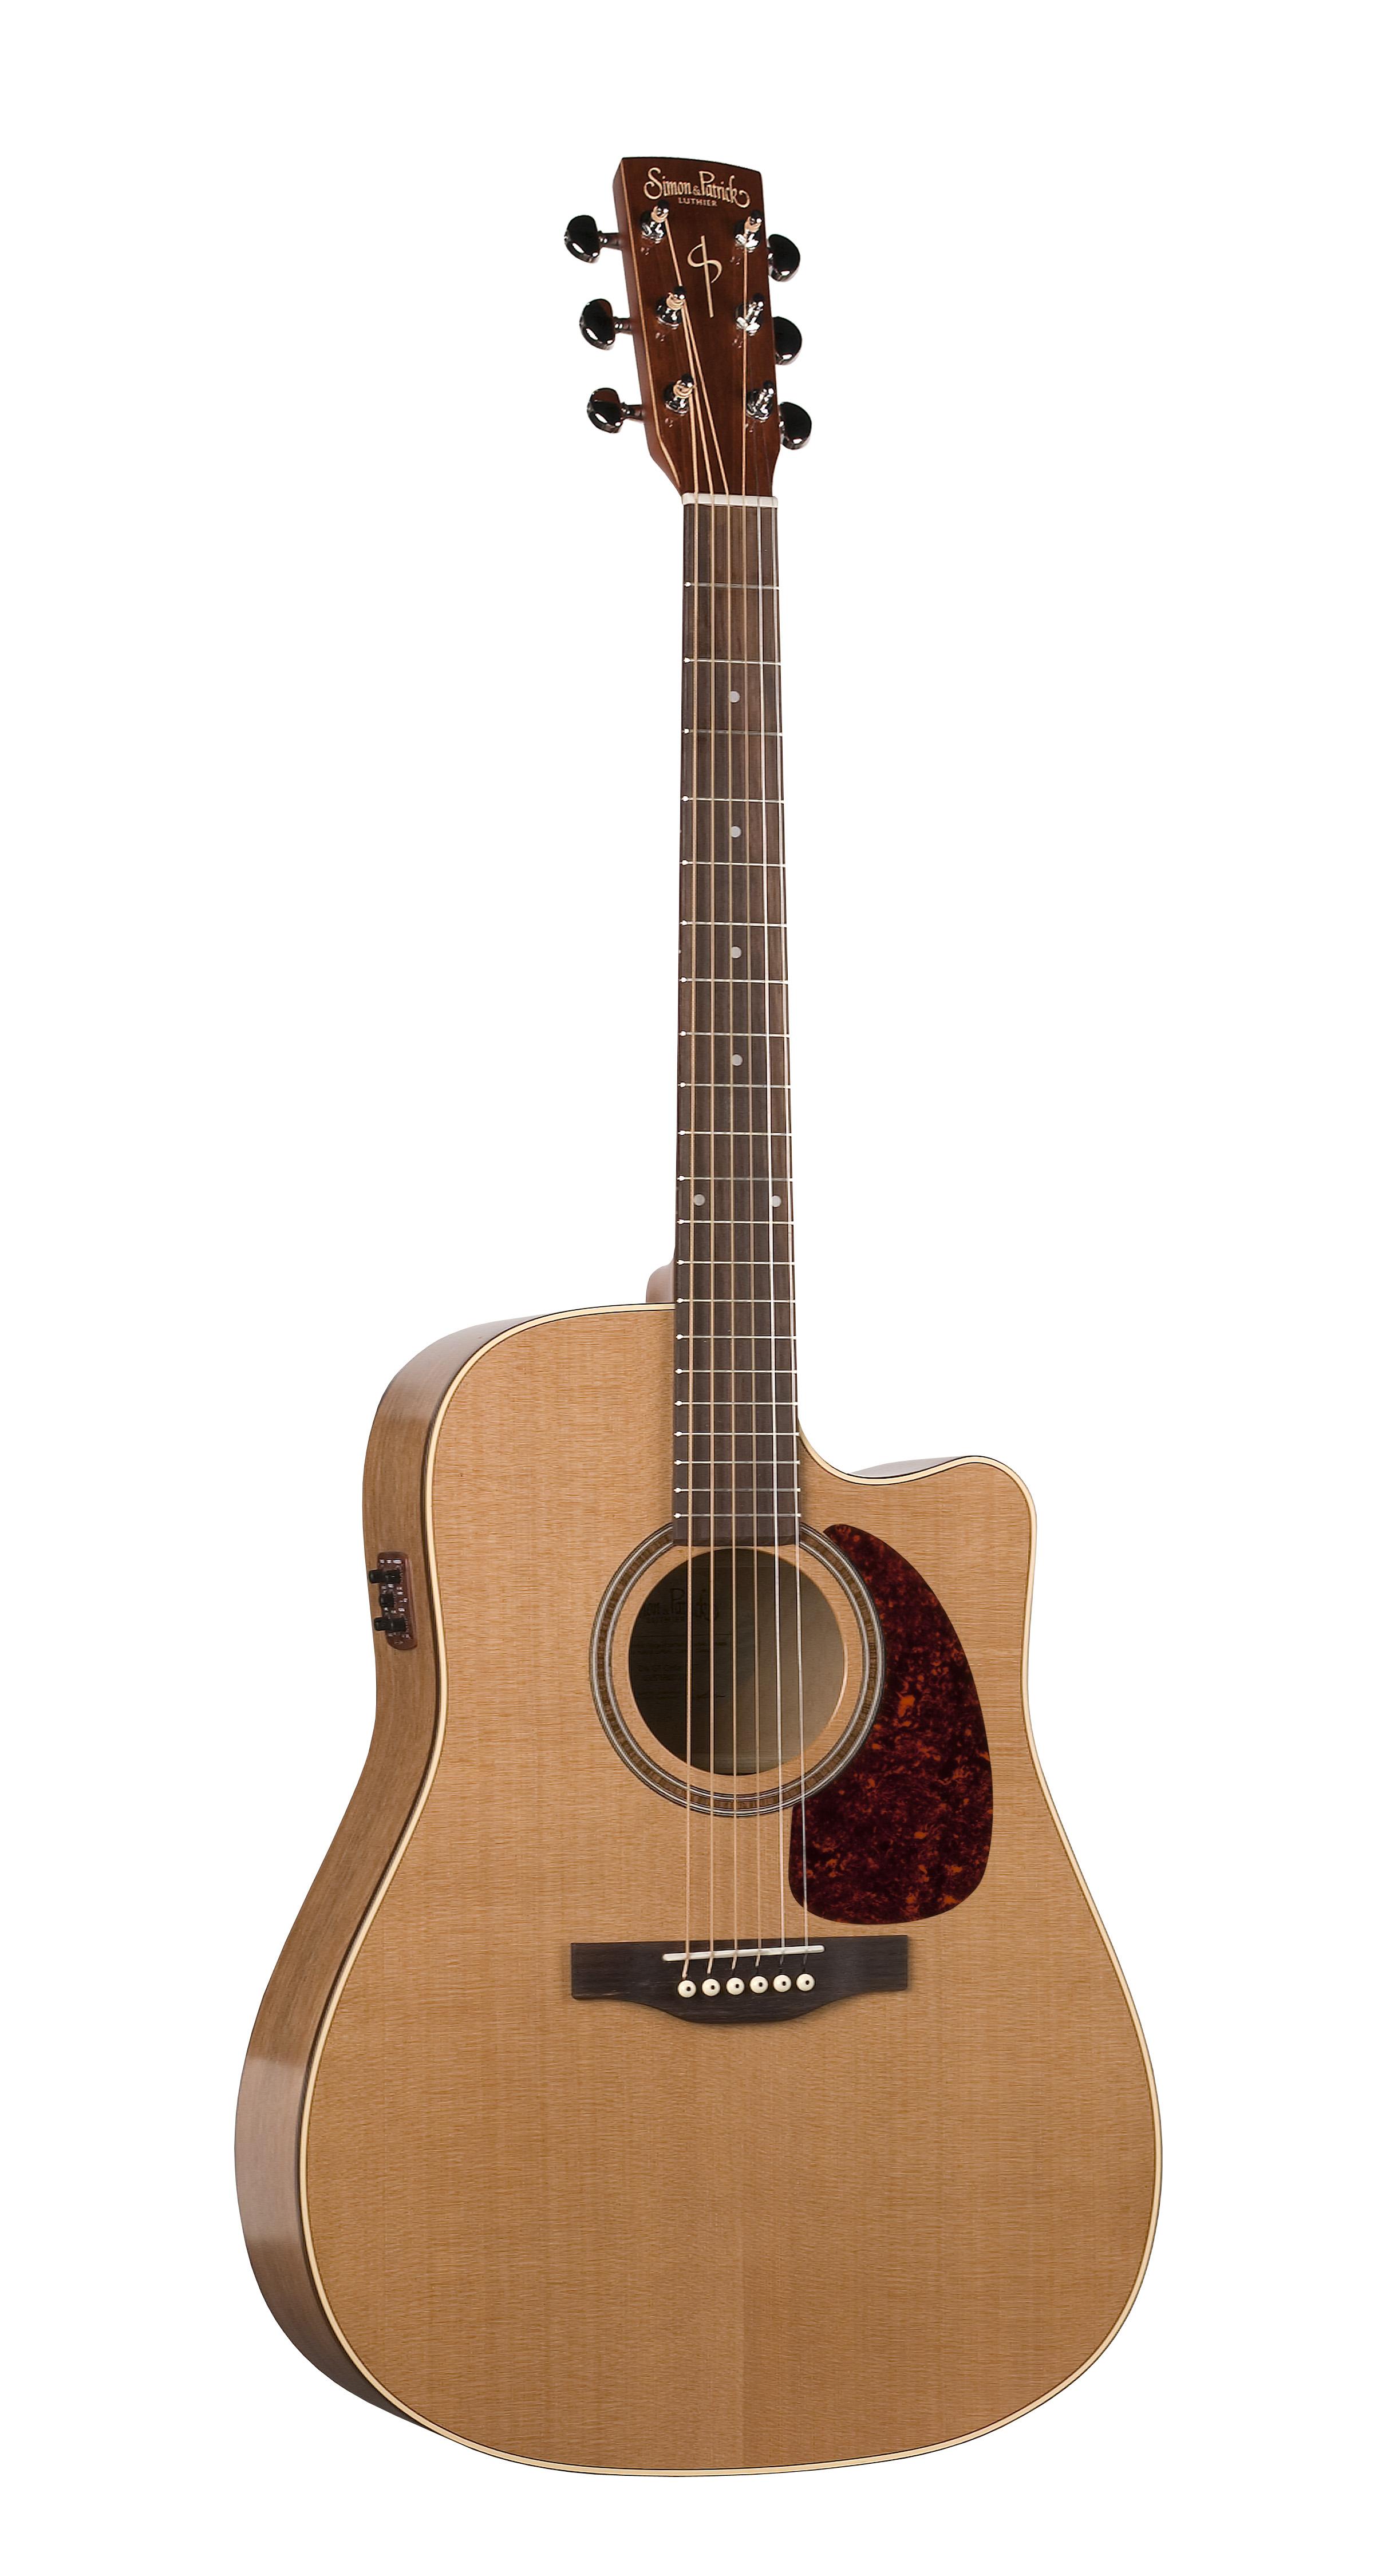 Simon & Patrick 33768 Cedar Gloss Top (GT) Dreadnought Acoustic Electric Guitar w/ B-band A3T